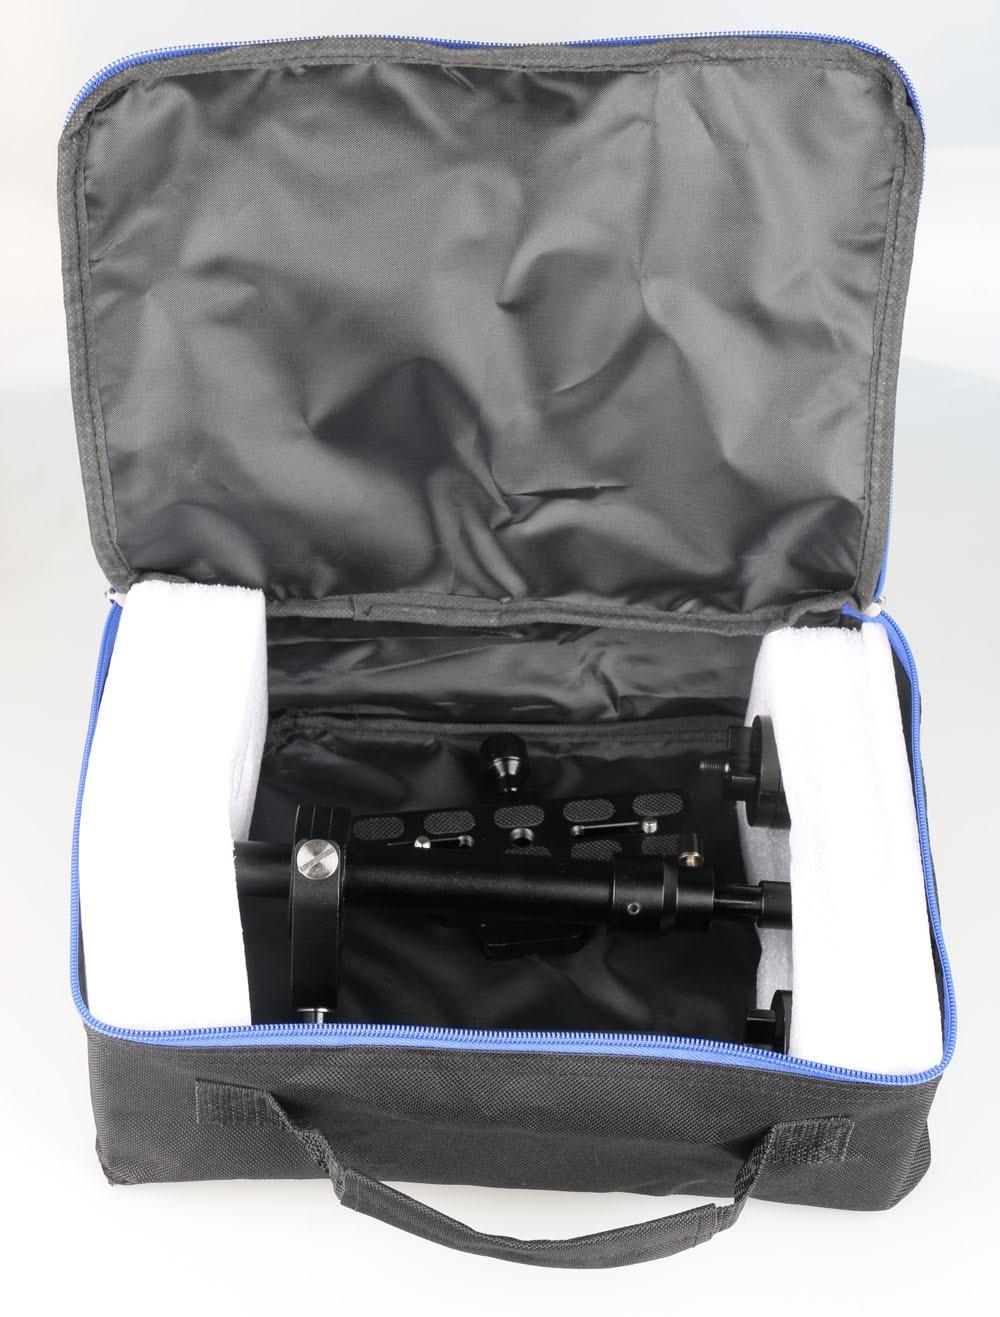 SF-04 1-2kg S40 + 0.4M 40CM Fiber Carbon Steadicam Steadycam - Κάμερα και φωτογραφία - Φωτογραφία 5